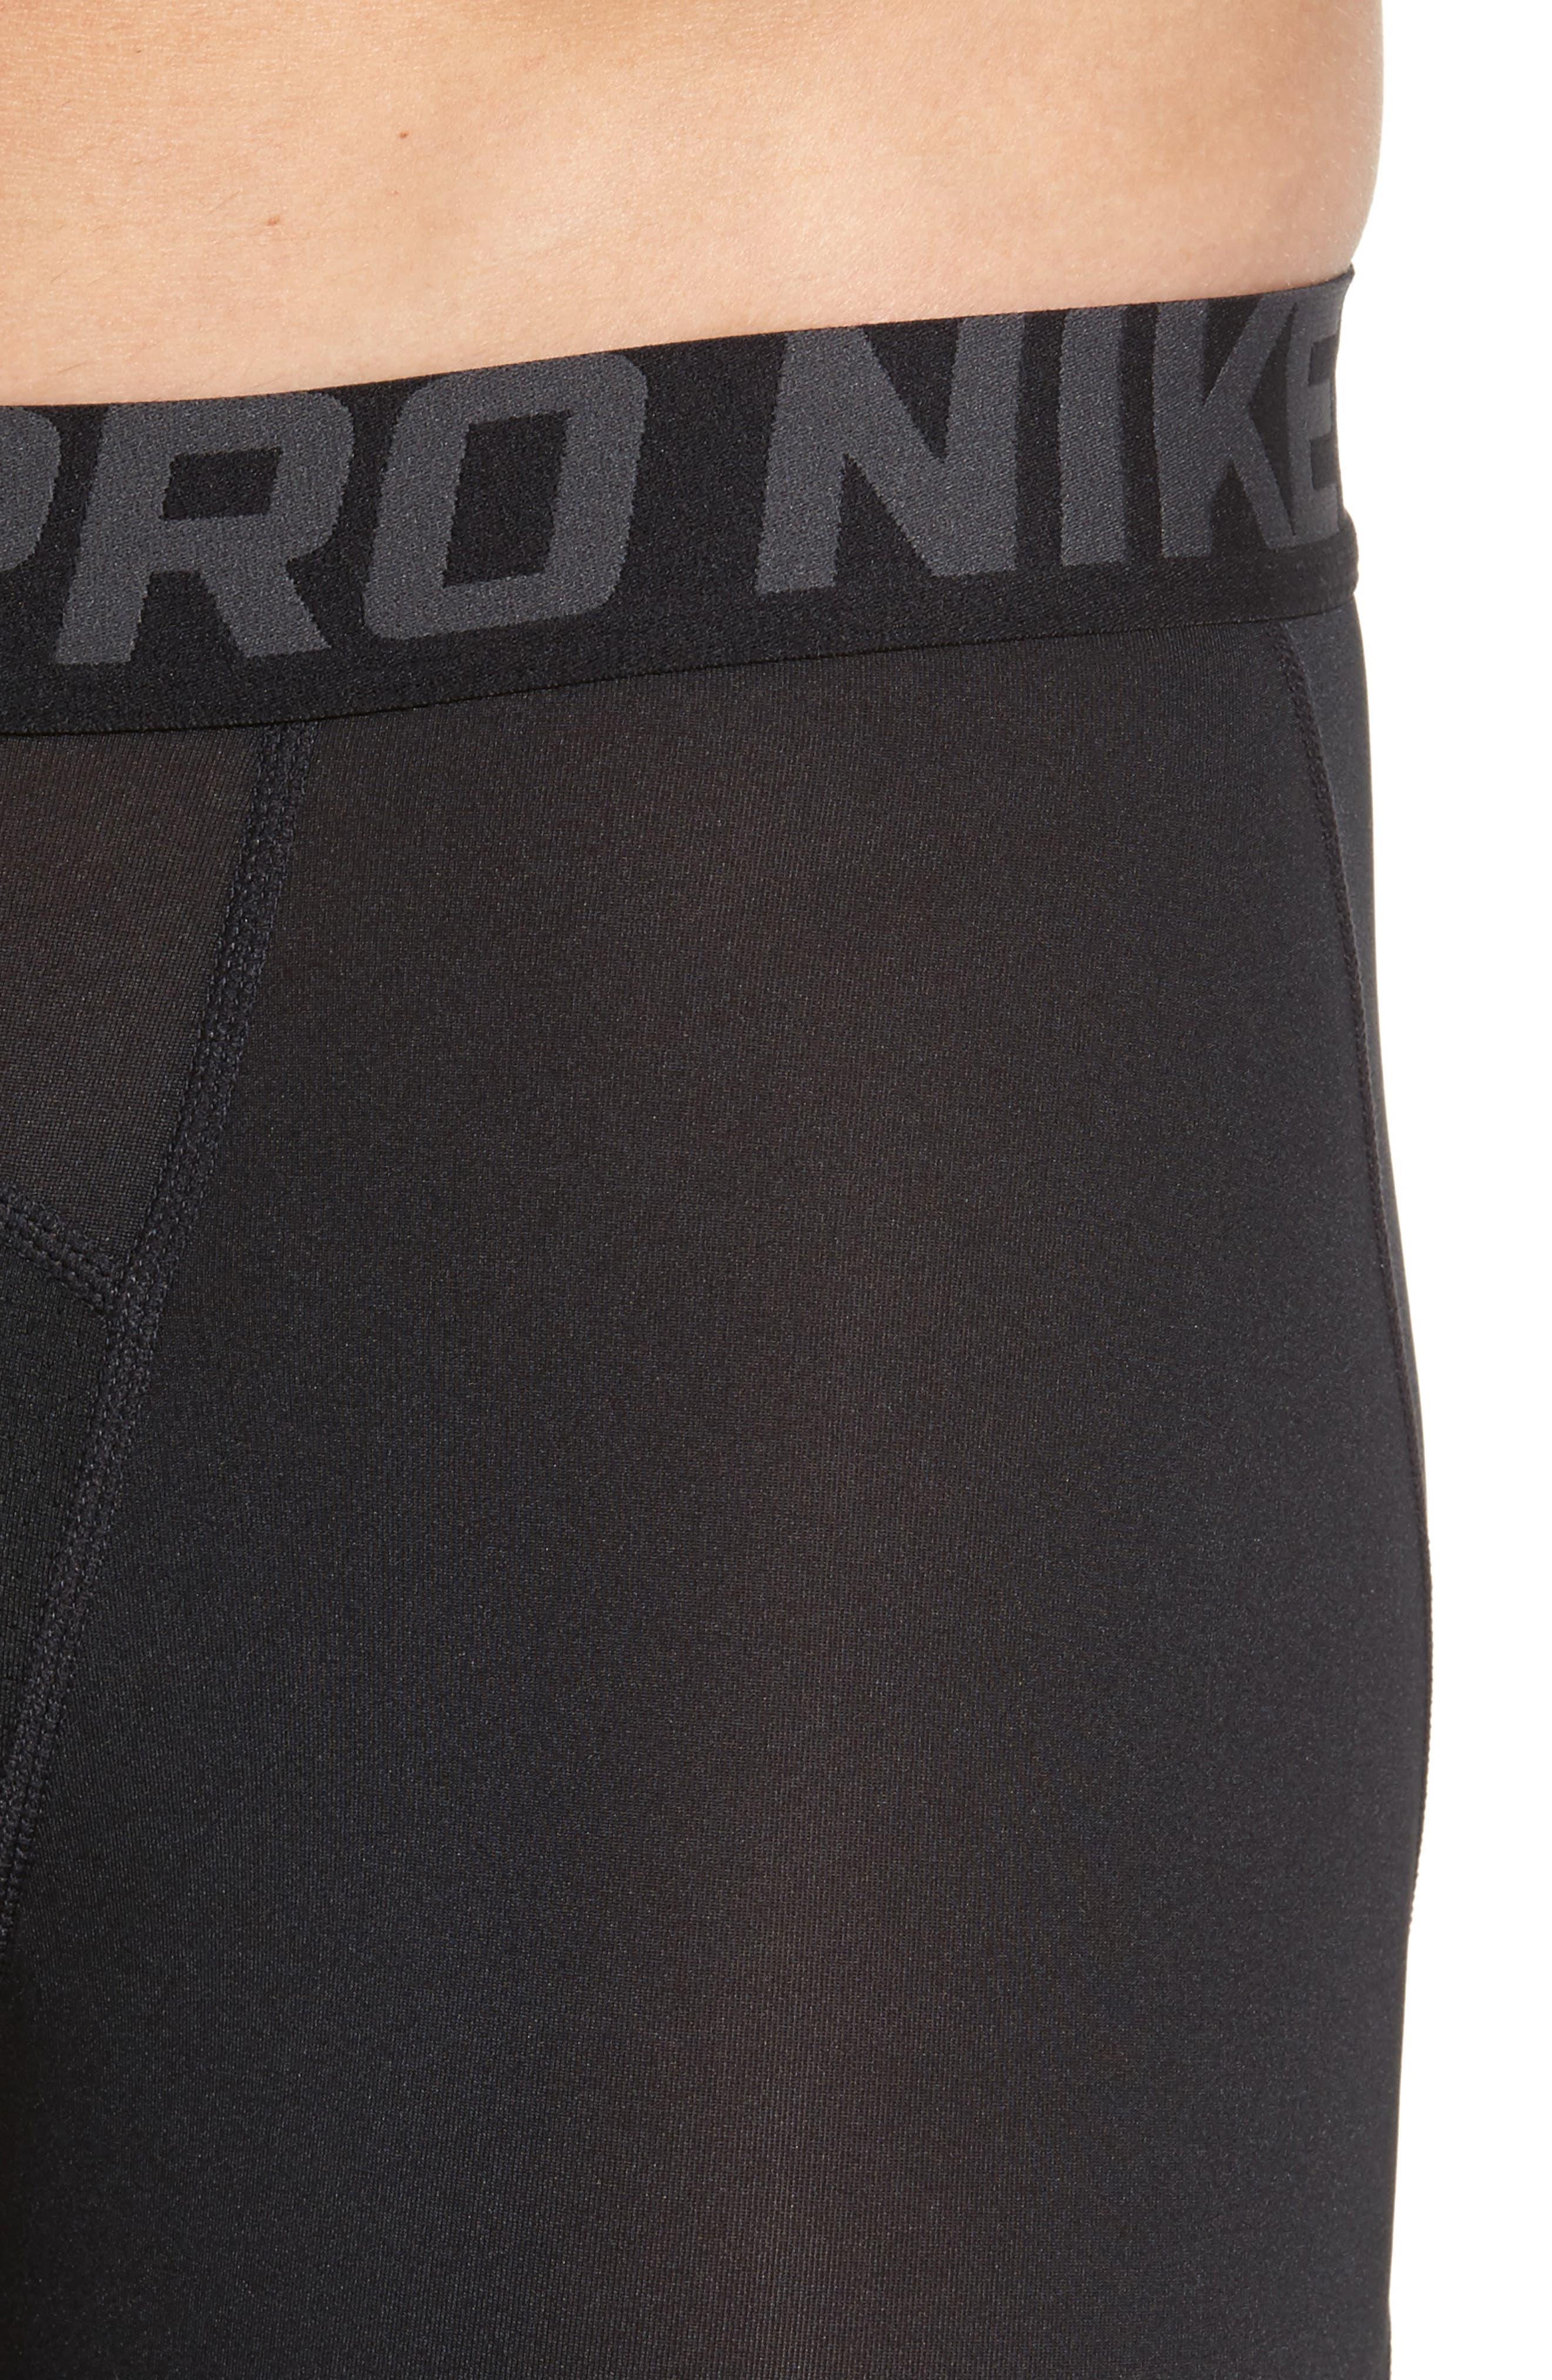 Pro Compression Shorts,                             Alternate thumbnail 10, color,